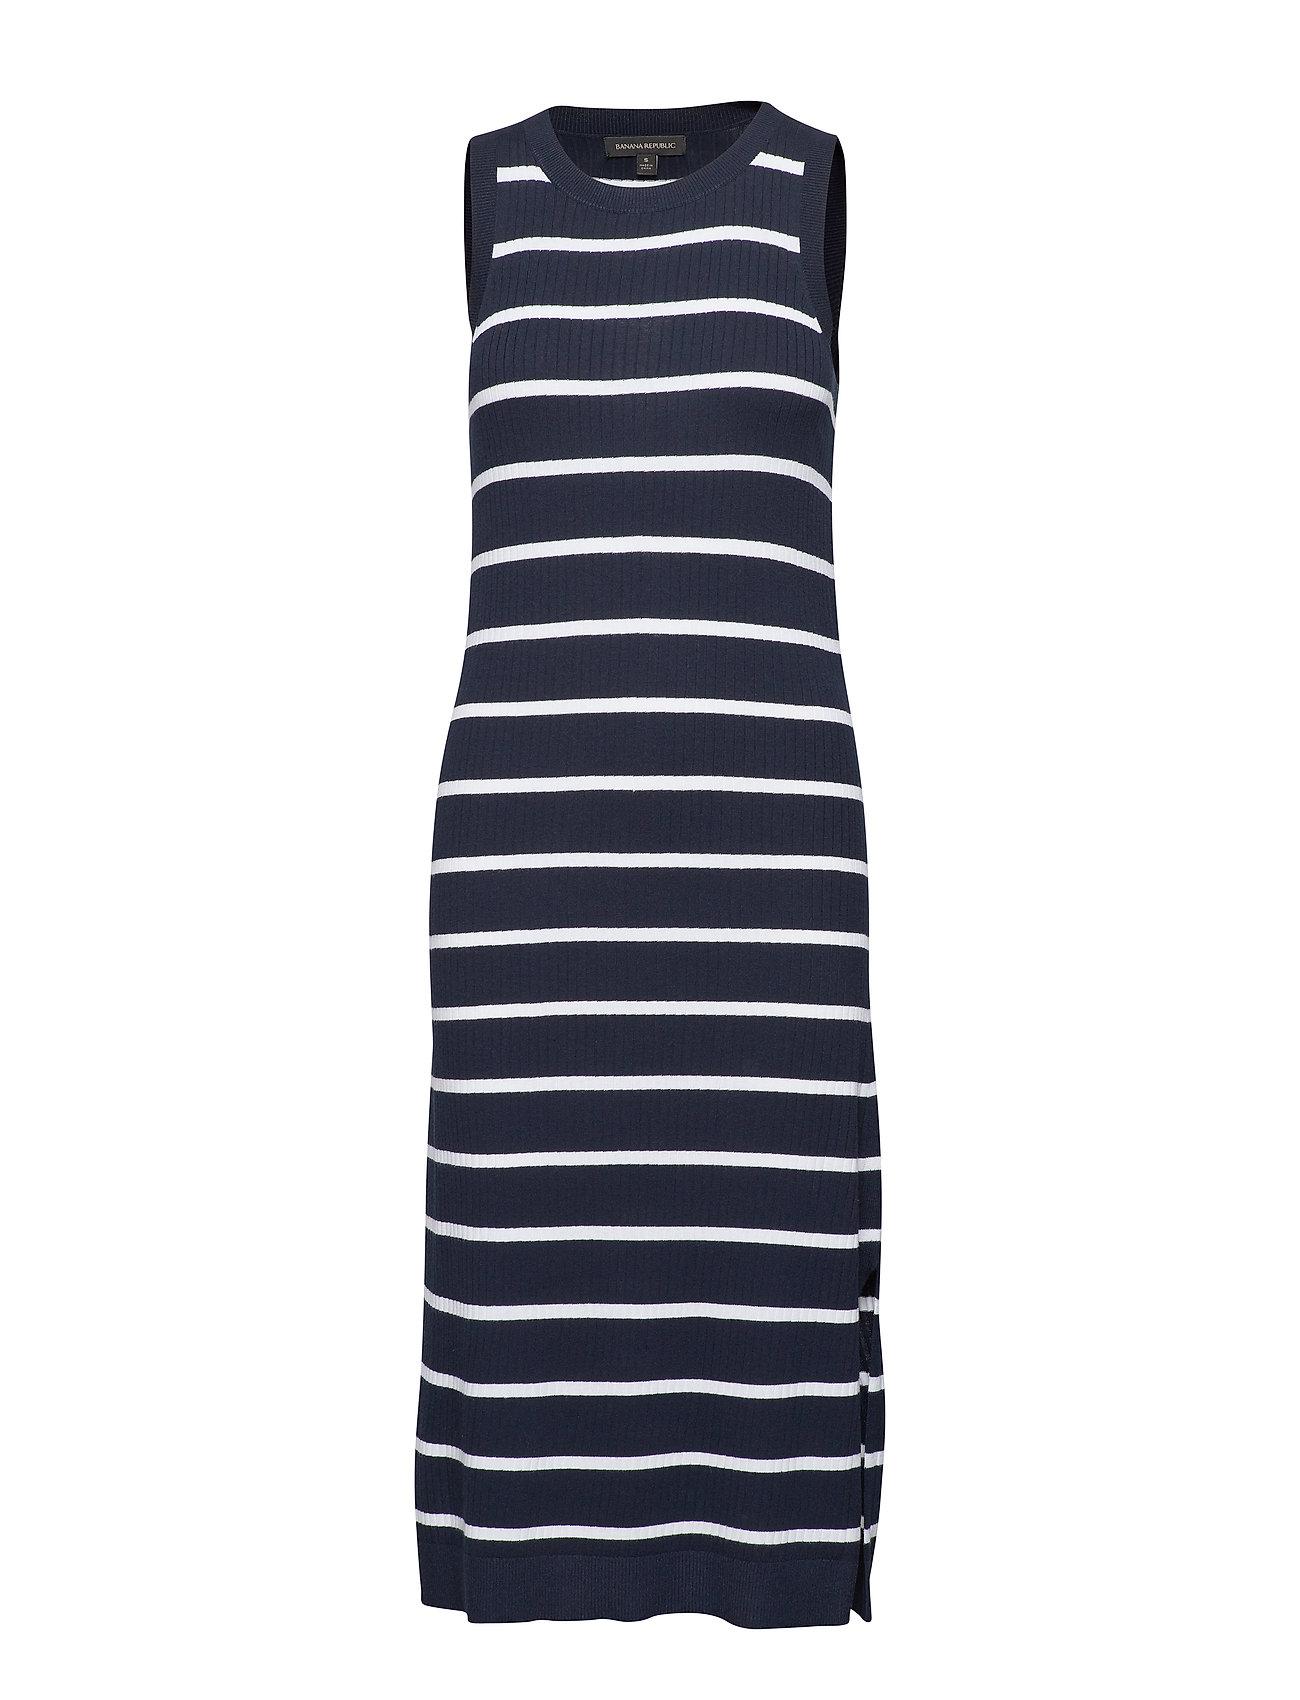 edca4e002c Sl Rib Column Sweater Dress Stripe (Preppy Navy) (£65) - Banana ...